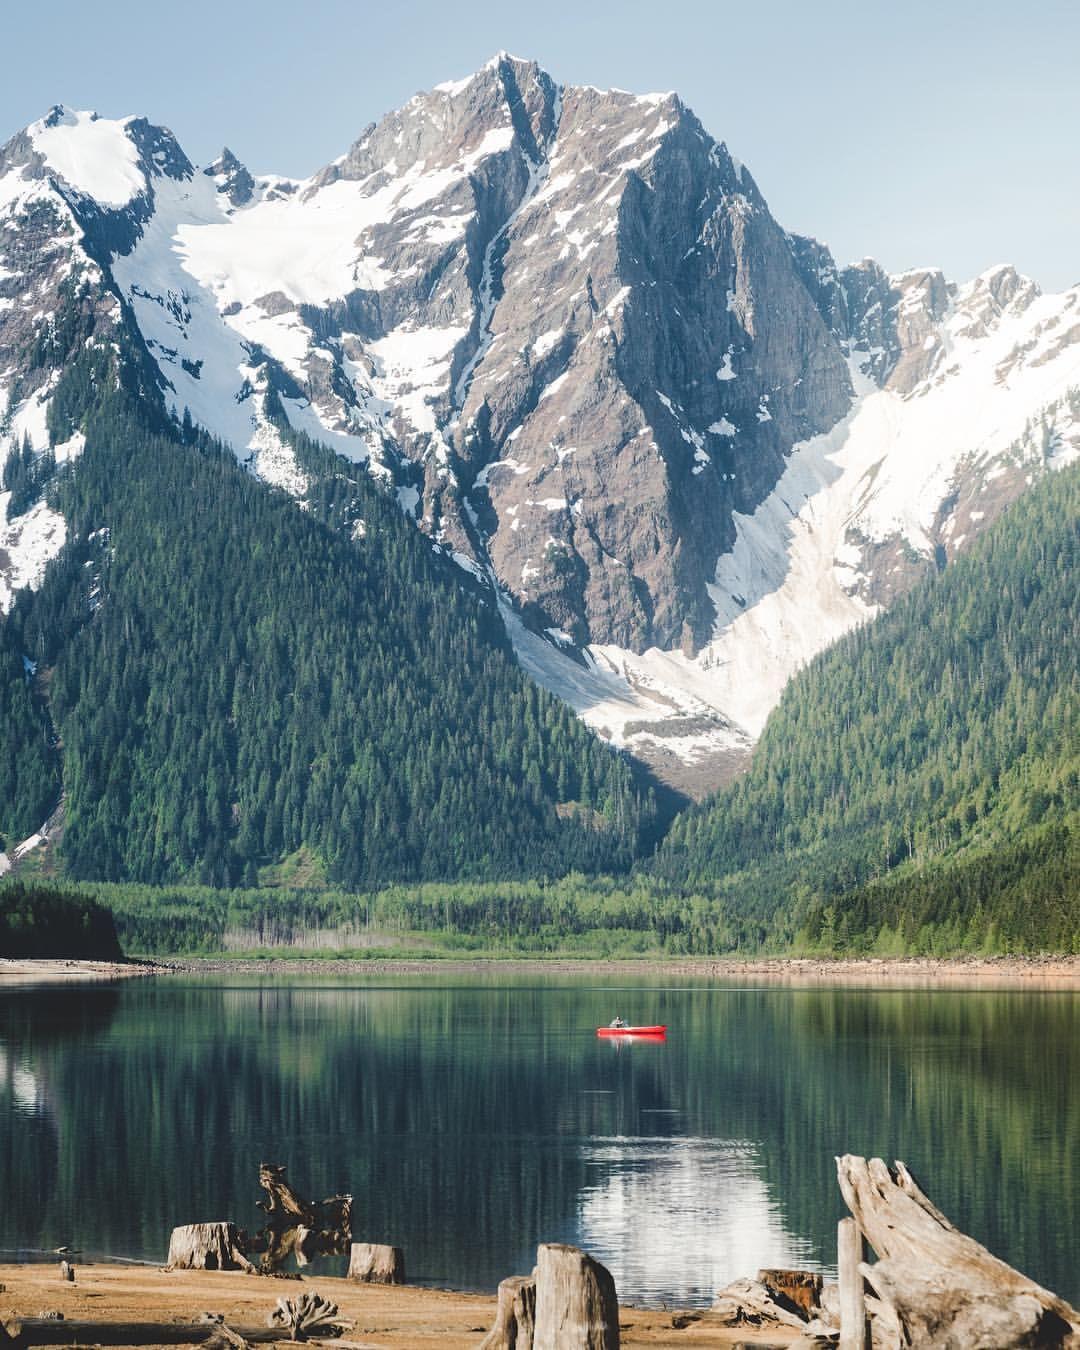 Lakes In Bc Canada: Jones Lake BC Canada Agassiz @braybraywoowoo